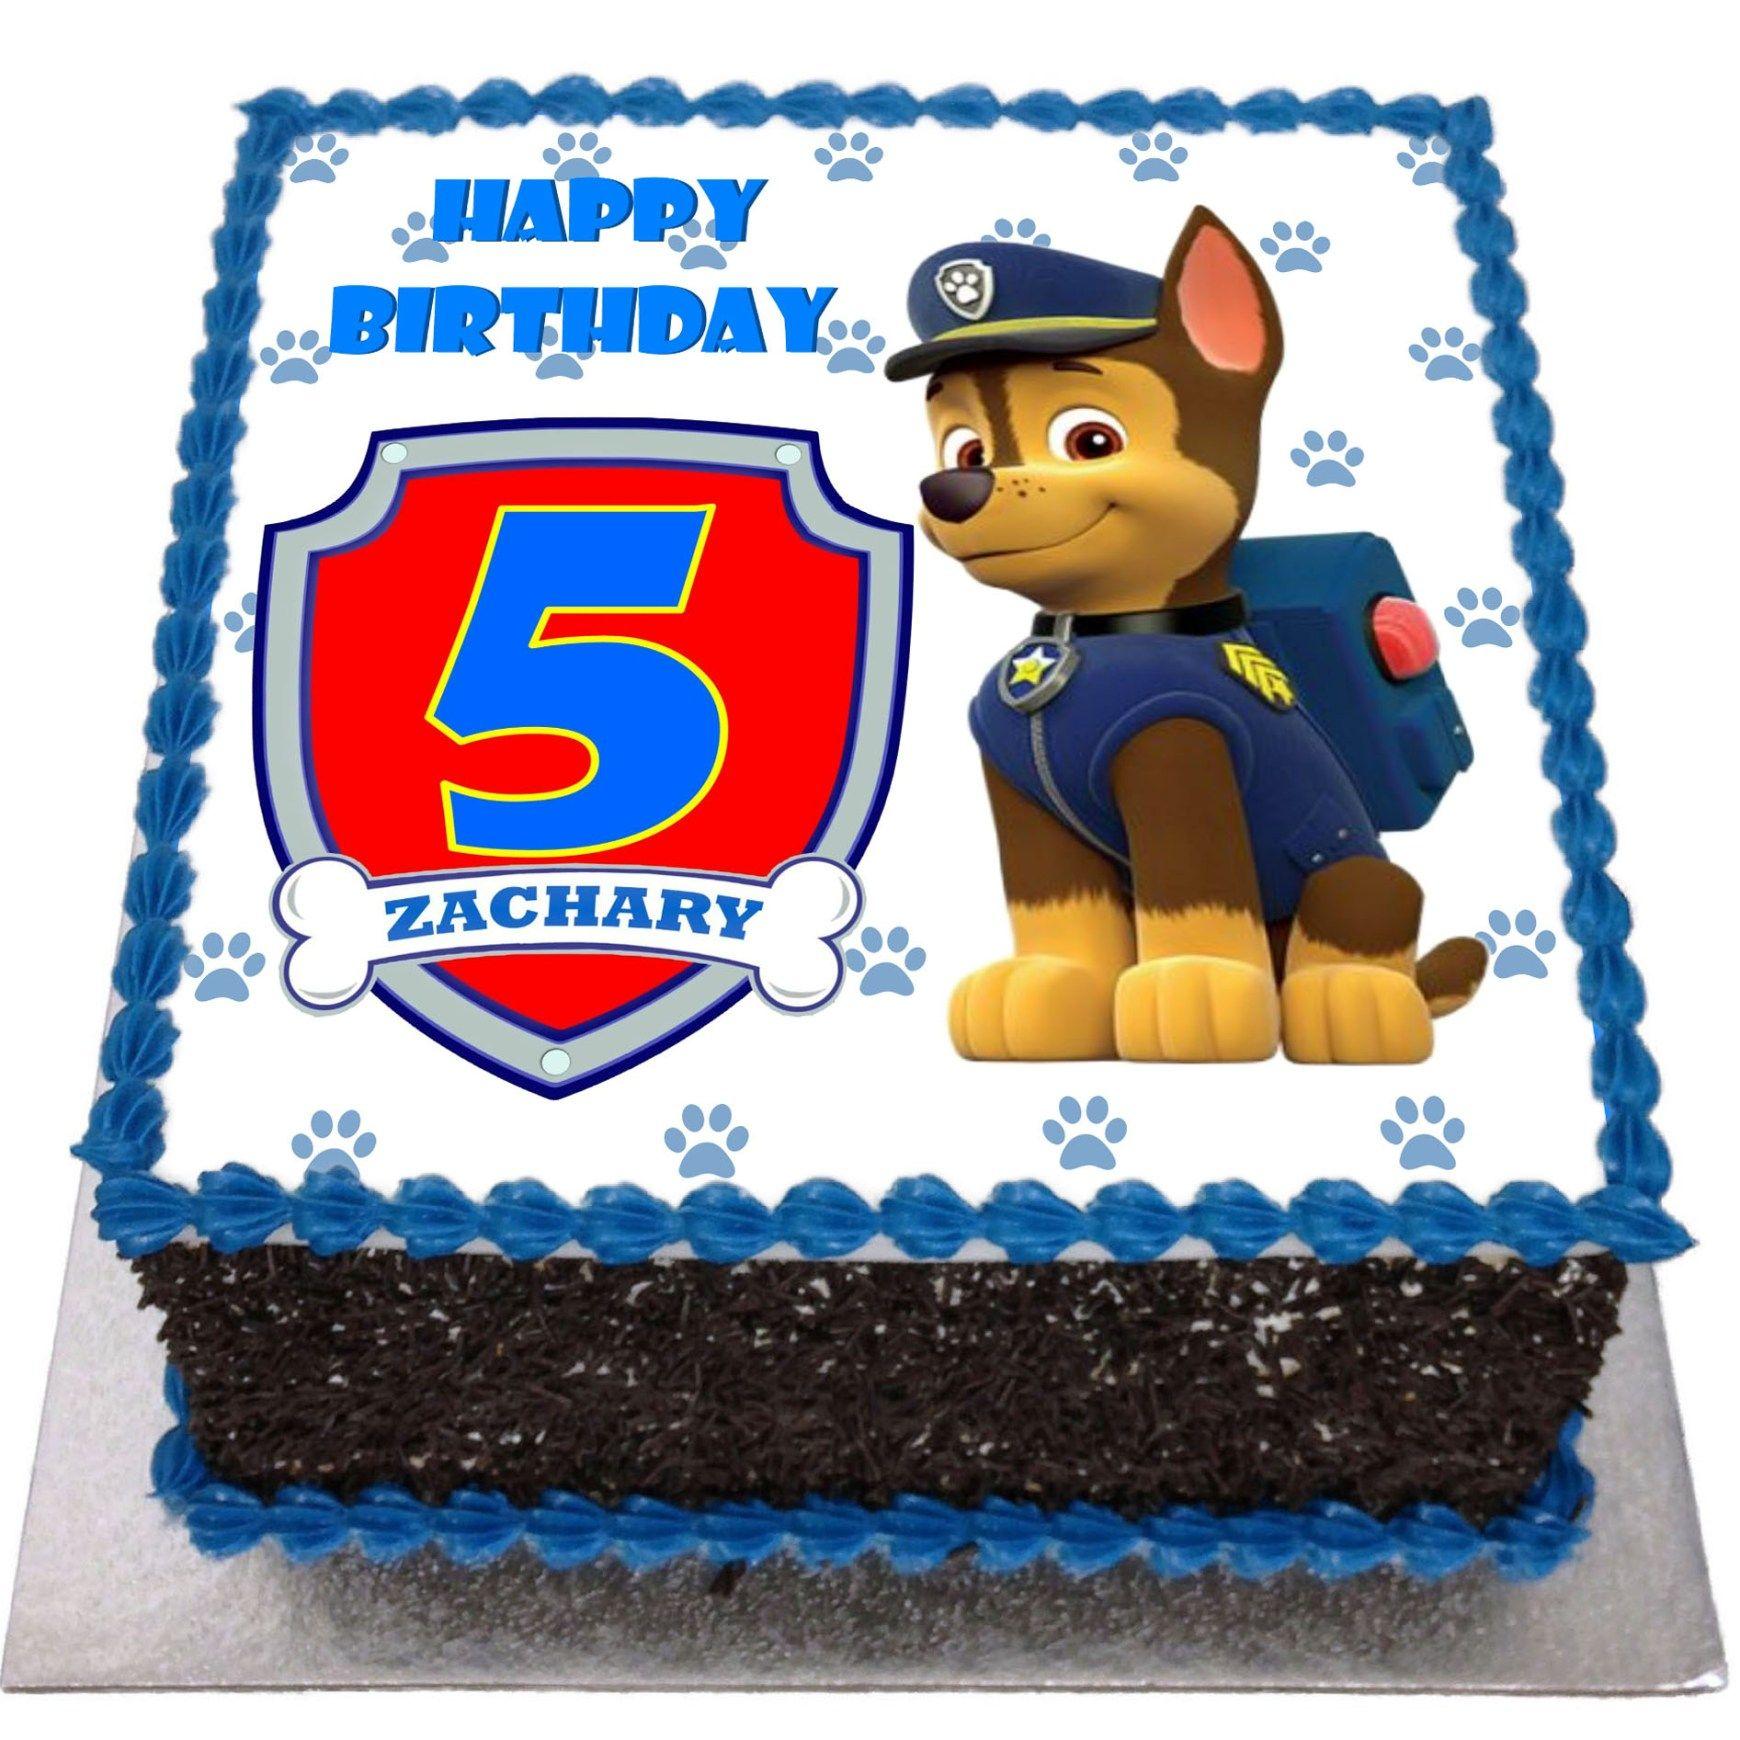 Paw patrol birthday cake paw patrol birthday cake flecks